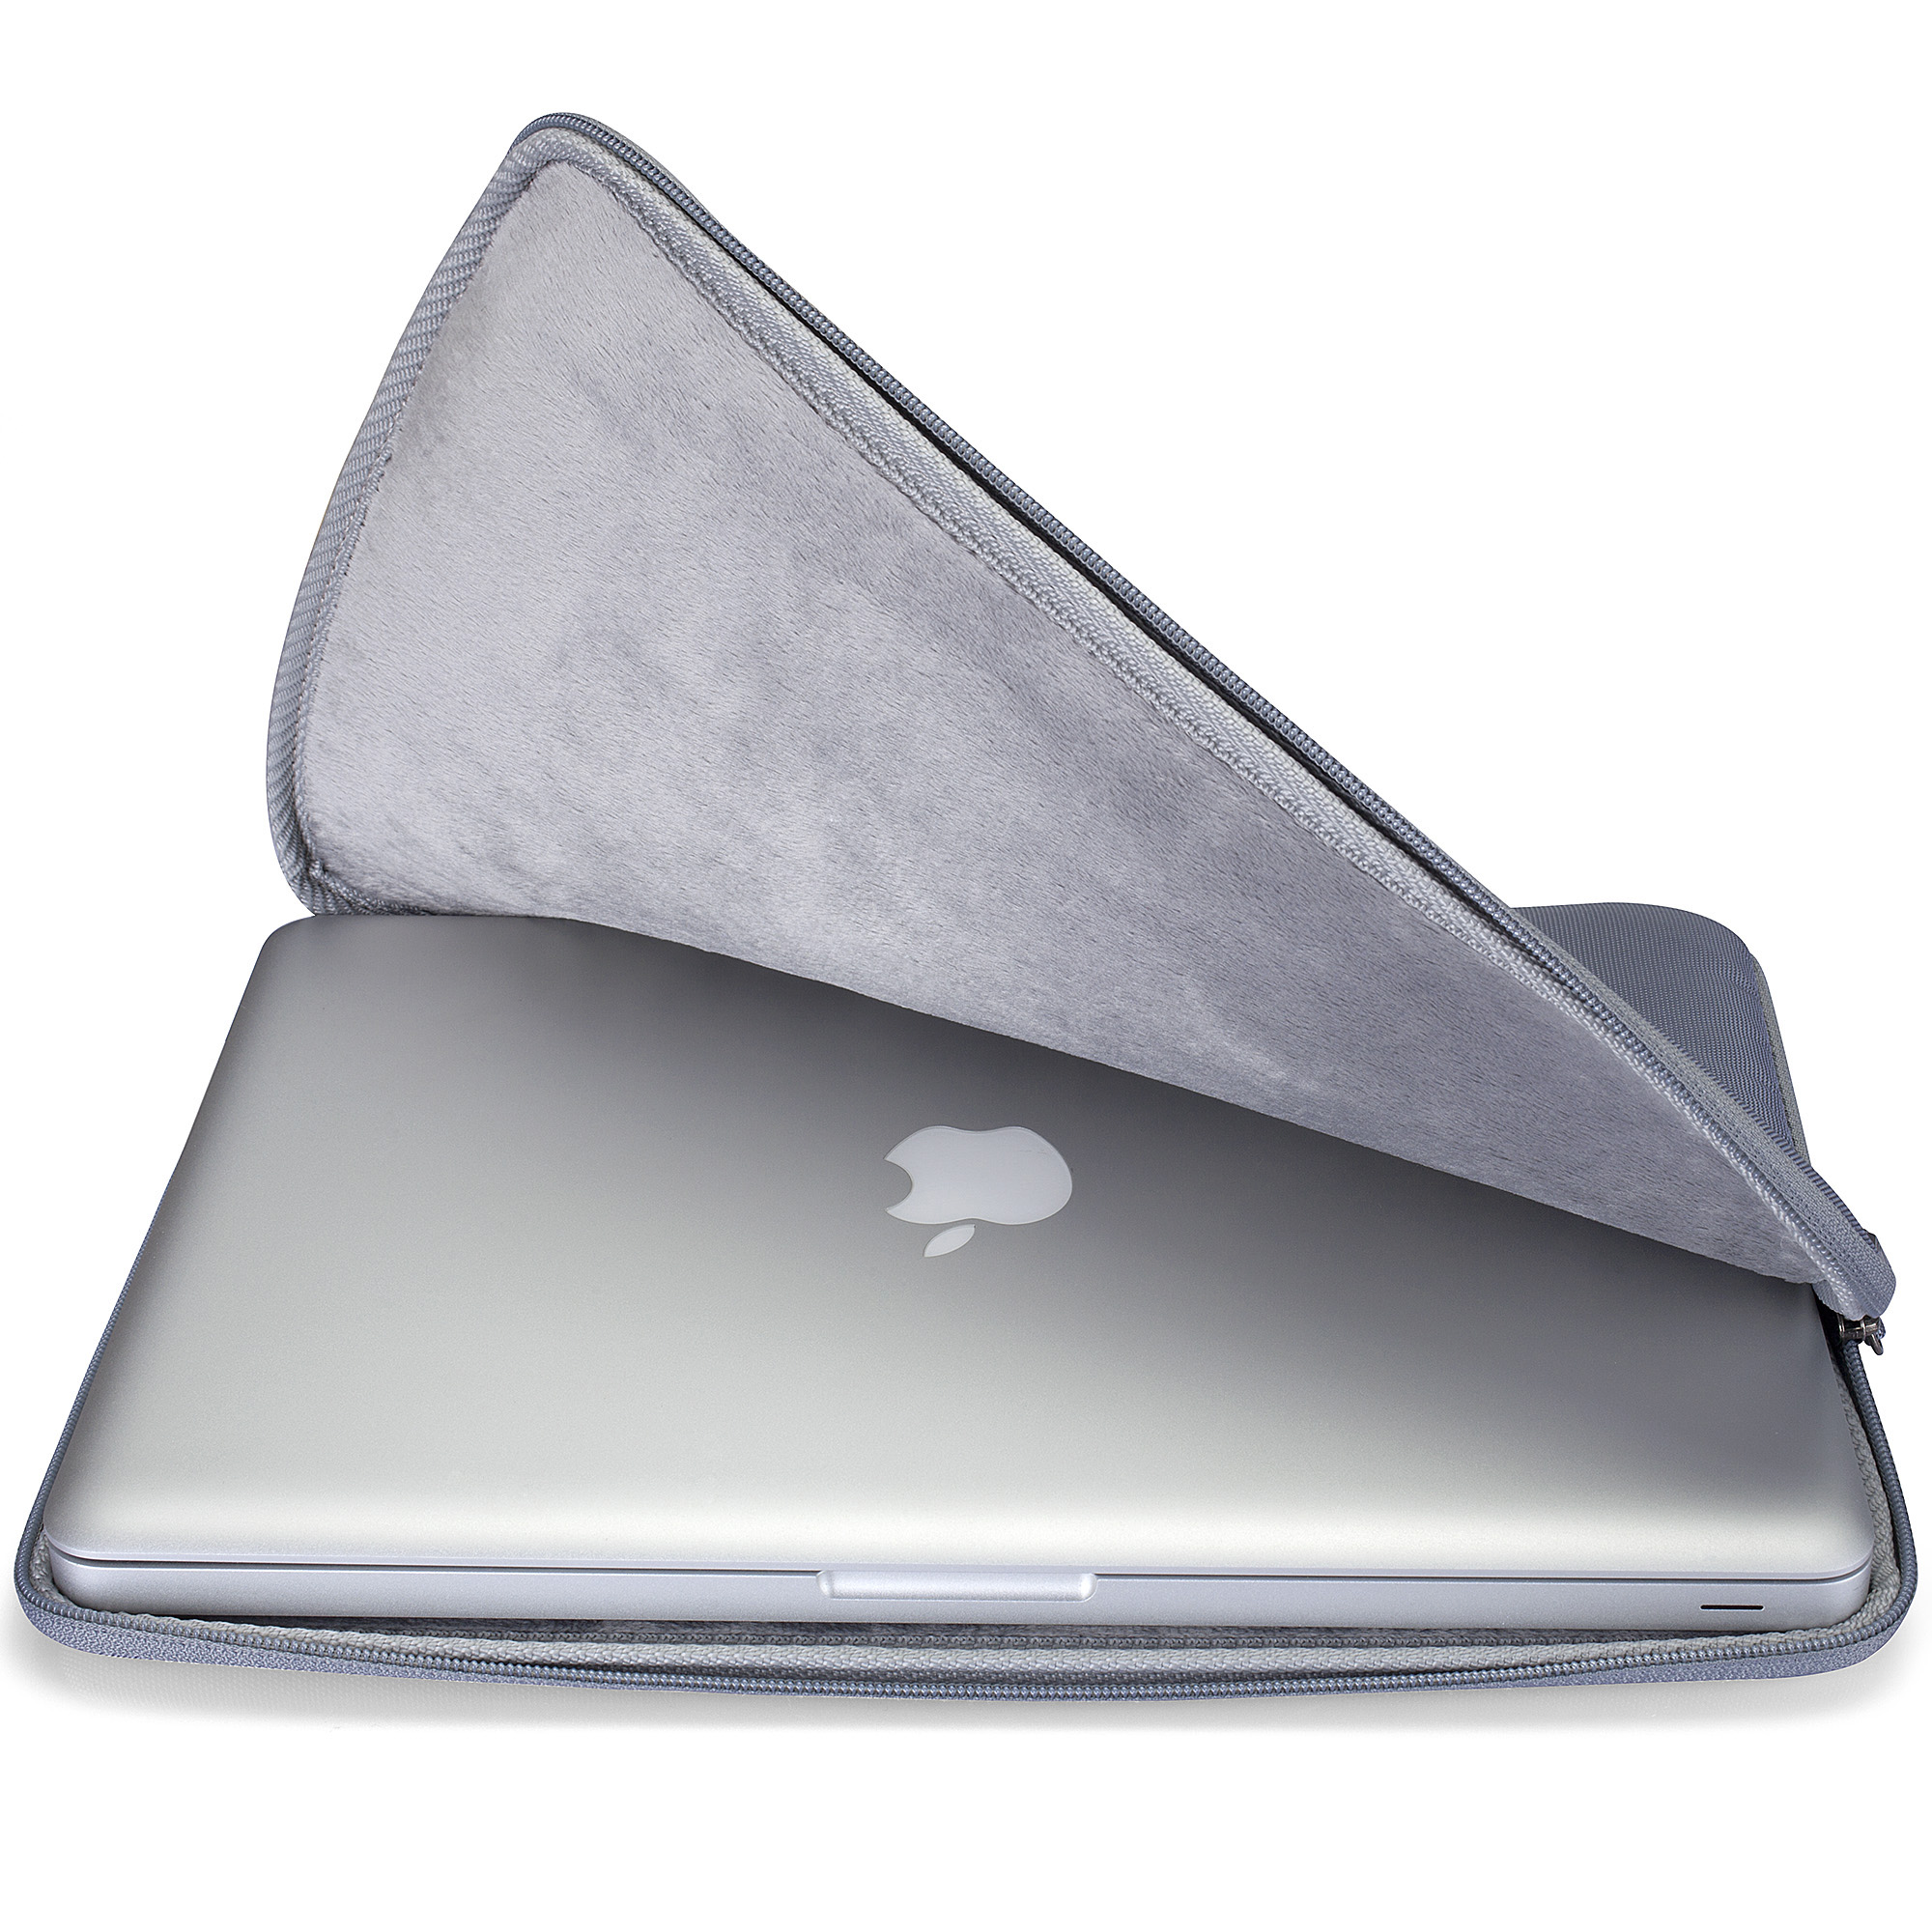 Soft Sleeve for MacBook 11 12 13 15 inch Retina Pro, Air Laptop Case 13.3 15.4   eBay